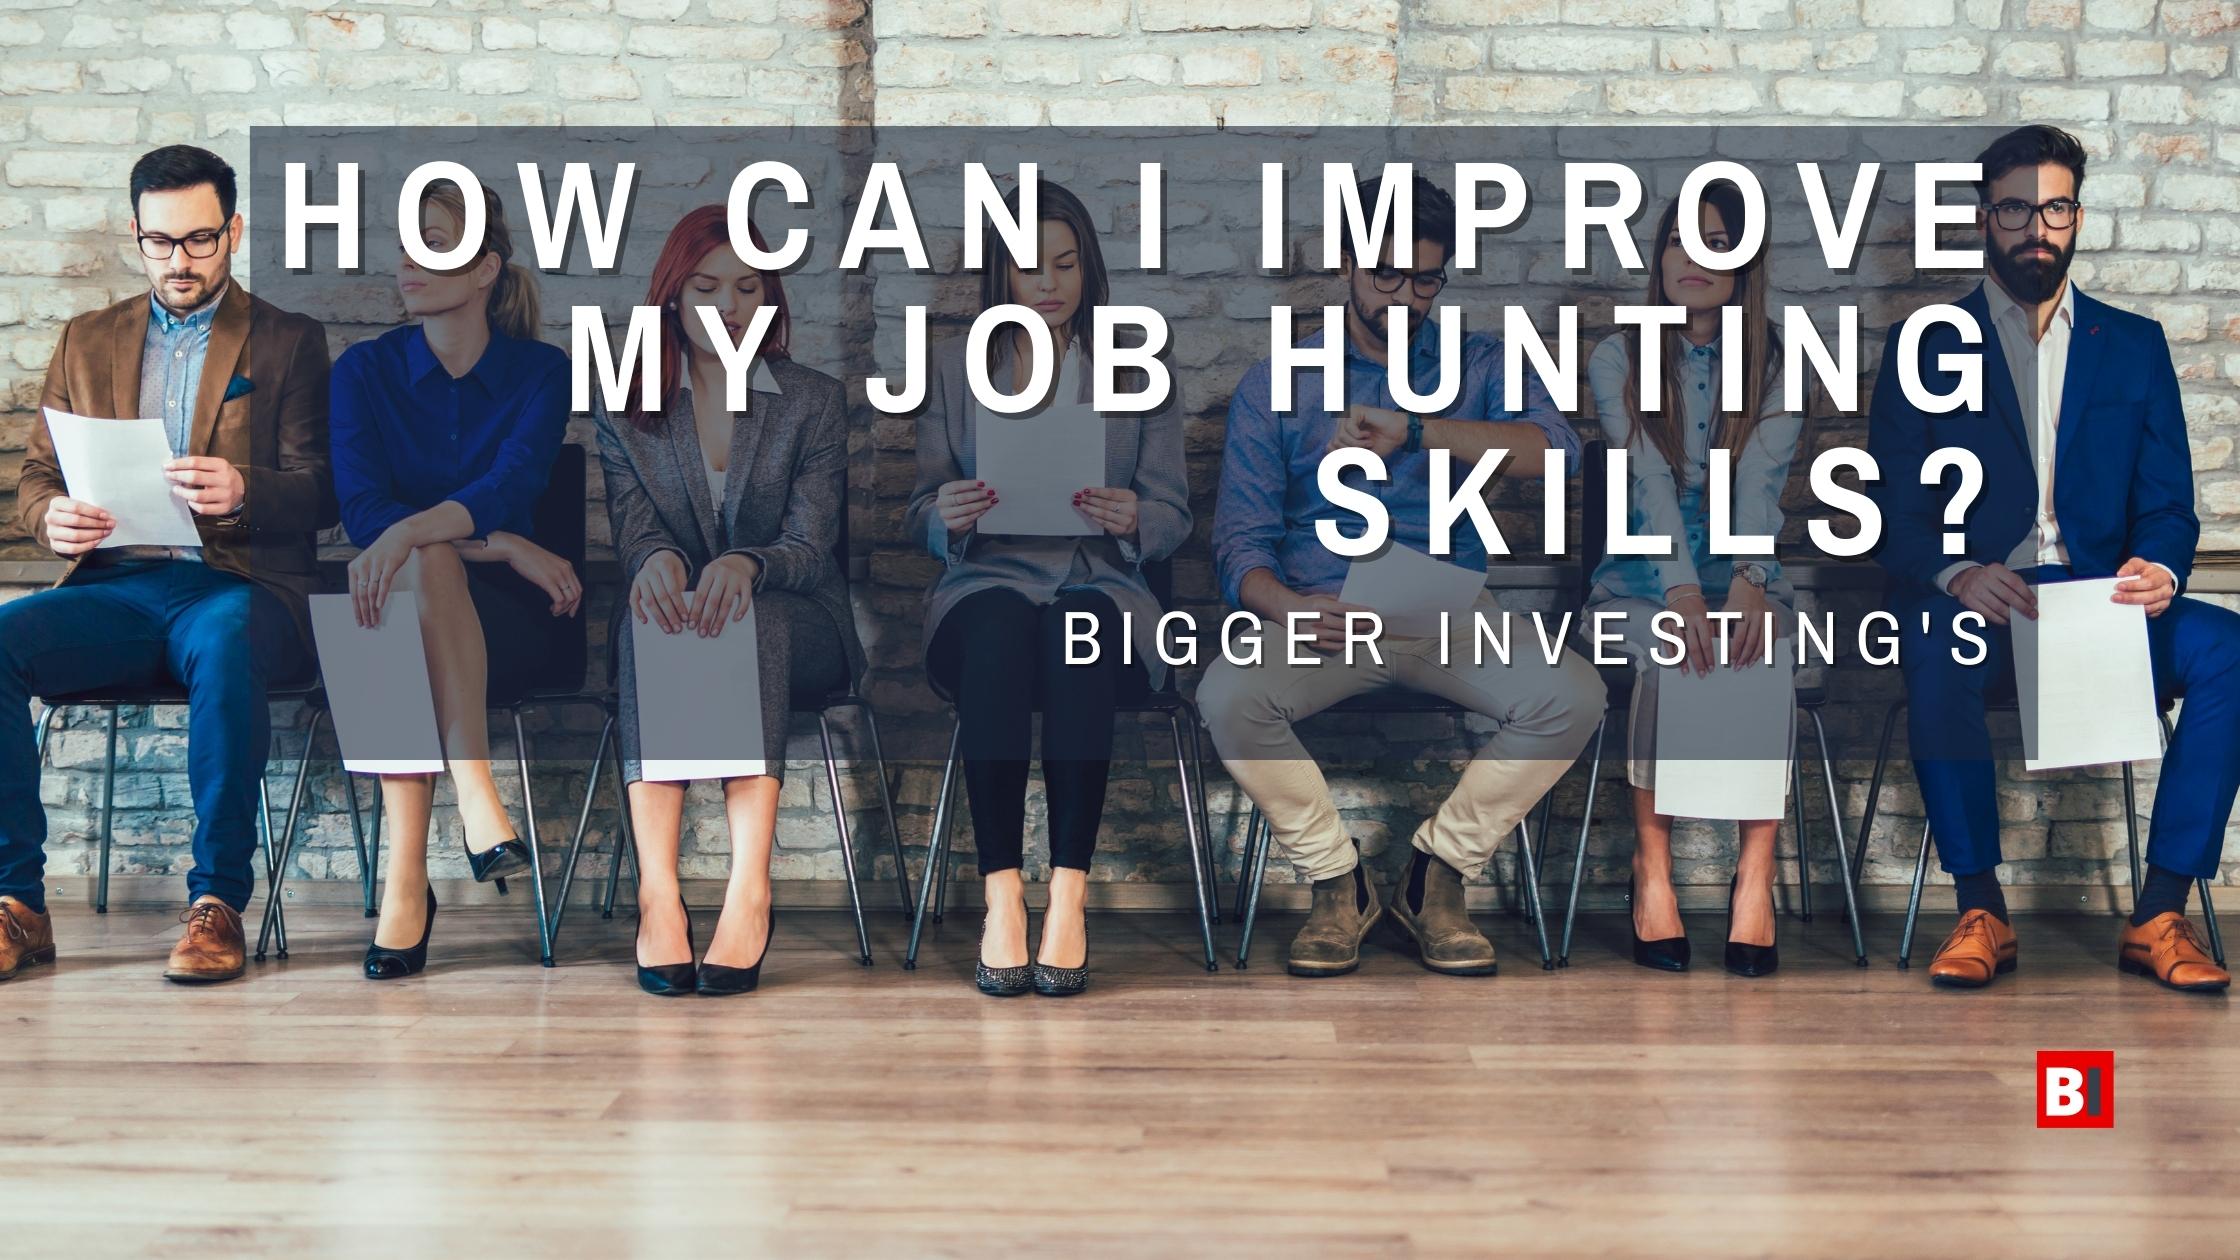 How Can I Improve My Job Hunting Skills?